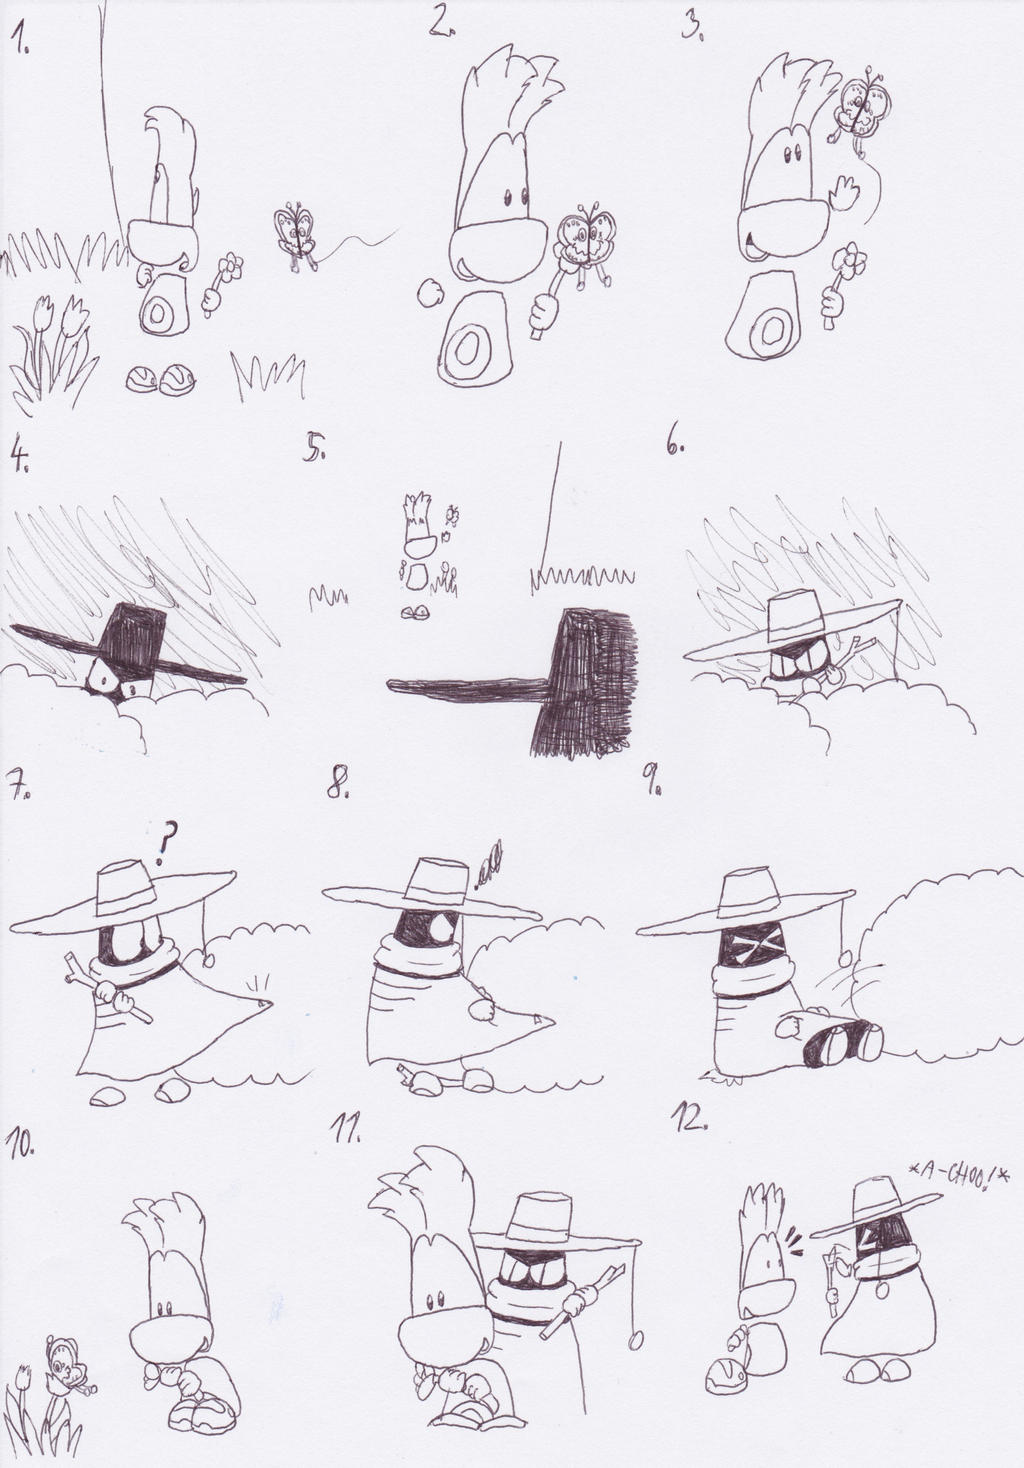 baby rayman comic part 1 by sailorraybloomdz on deviantart